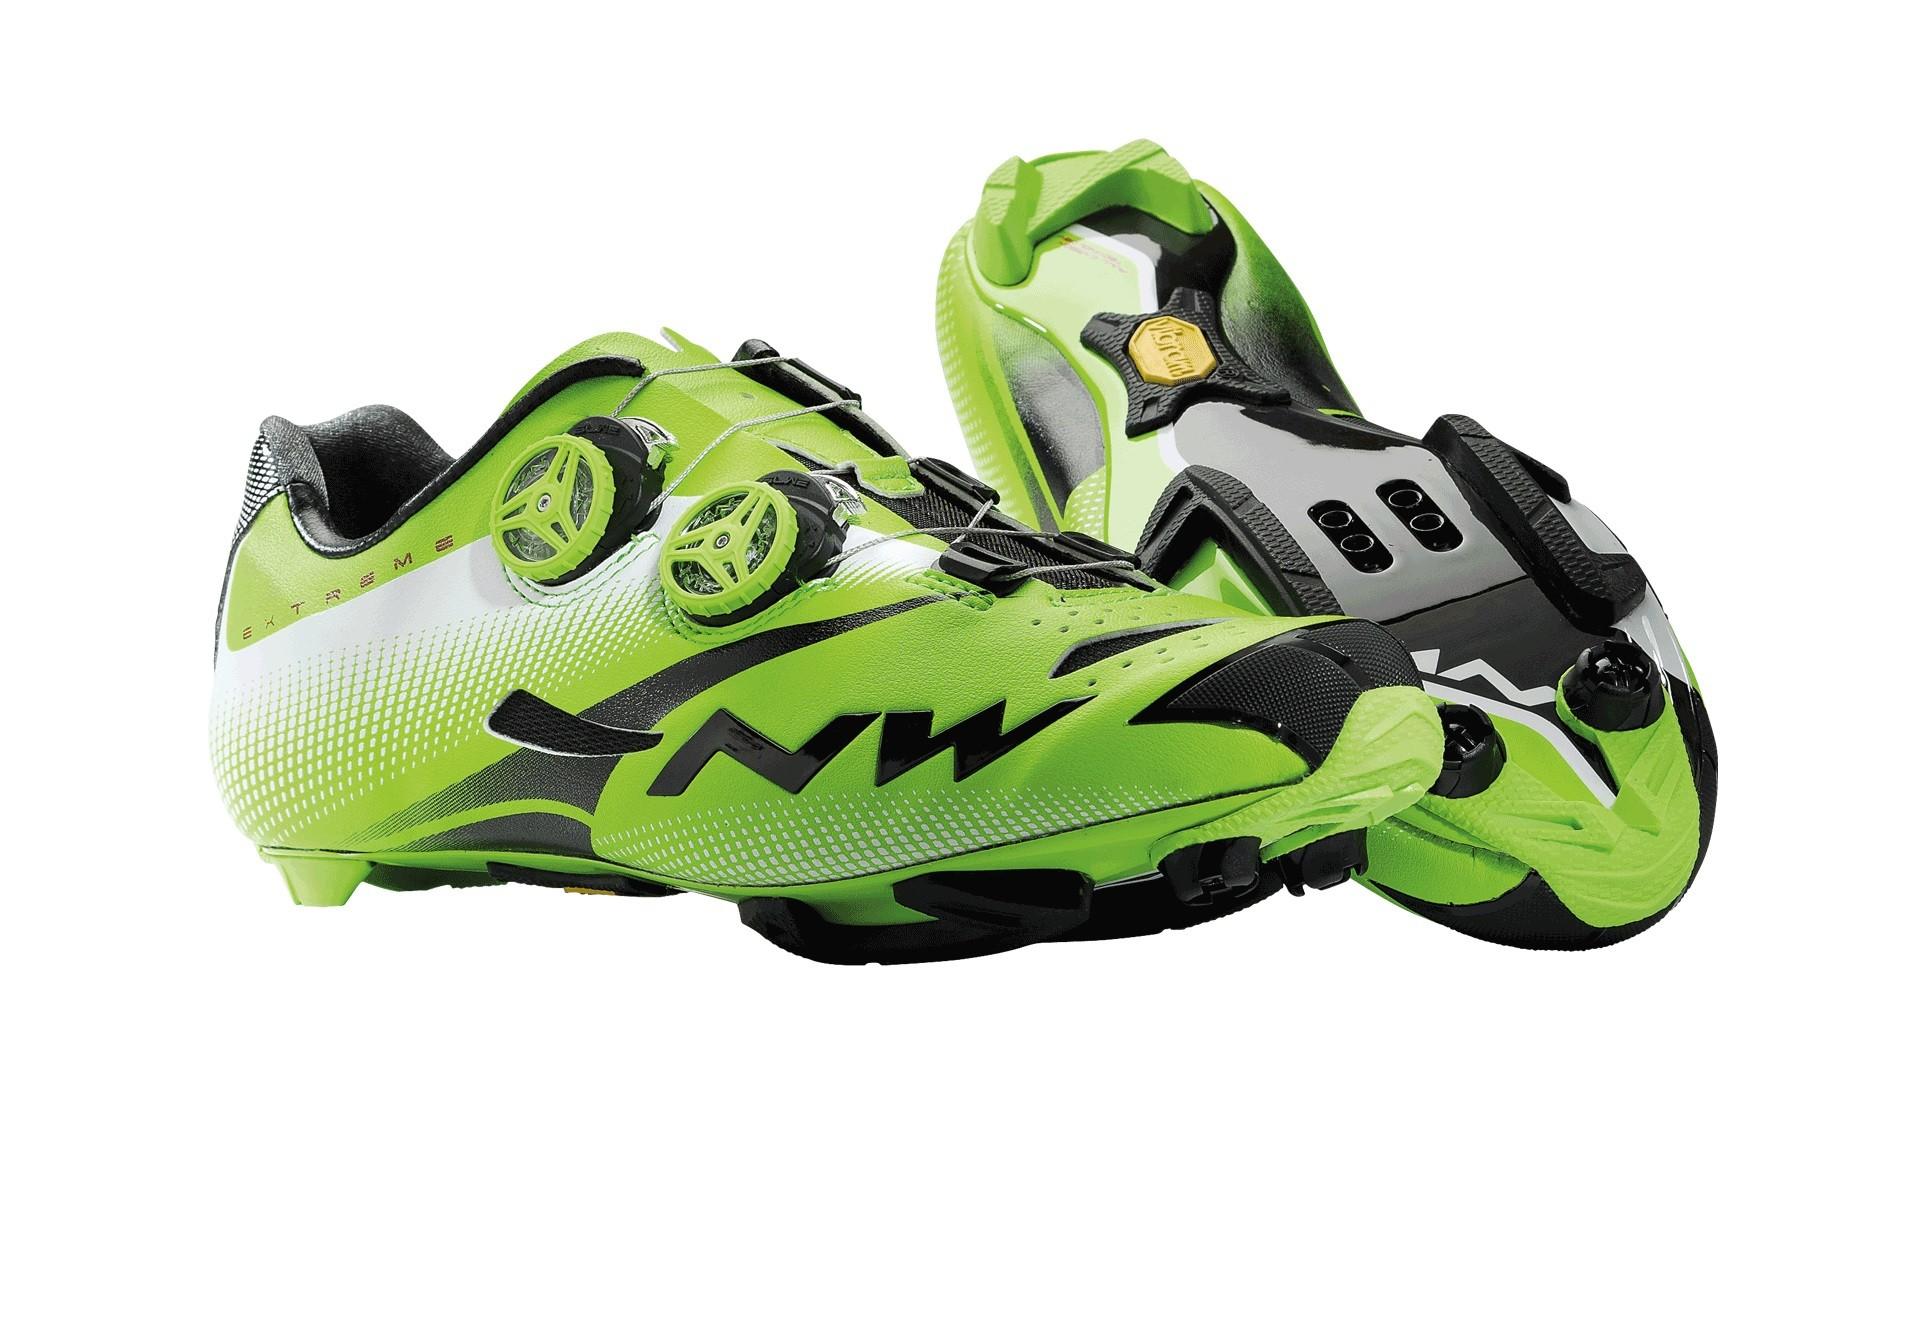 online retailer b0c59 c1f95 scarpa Extreme Tech MTB Plus